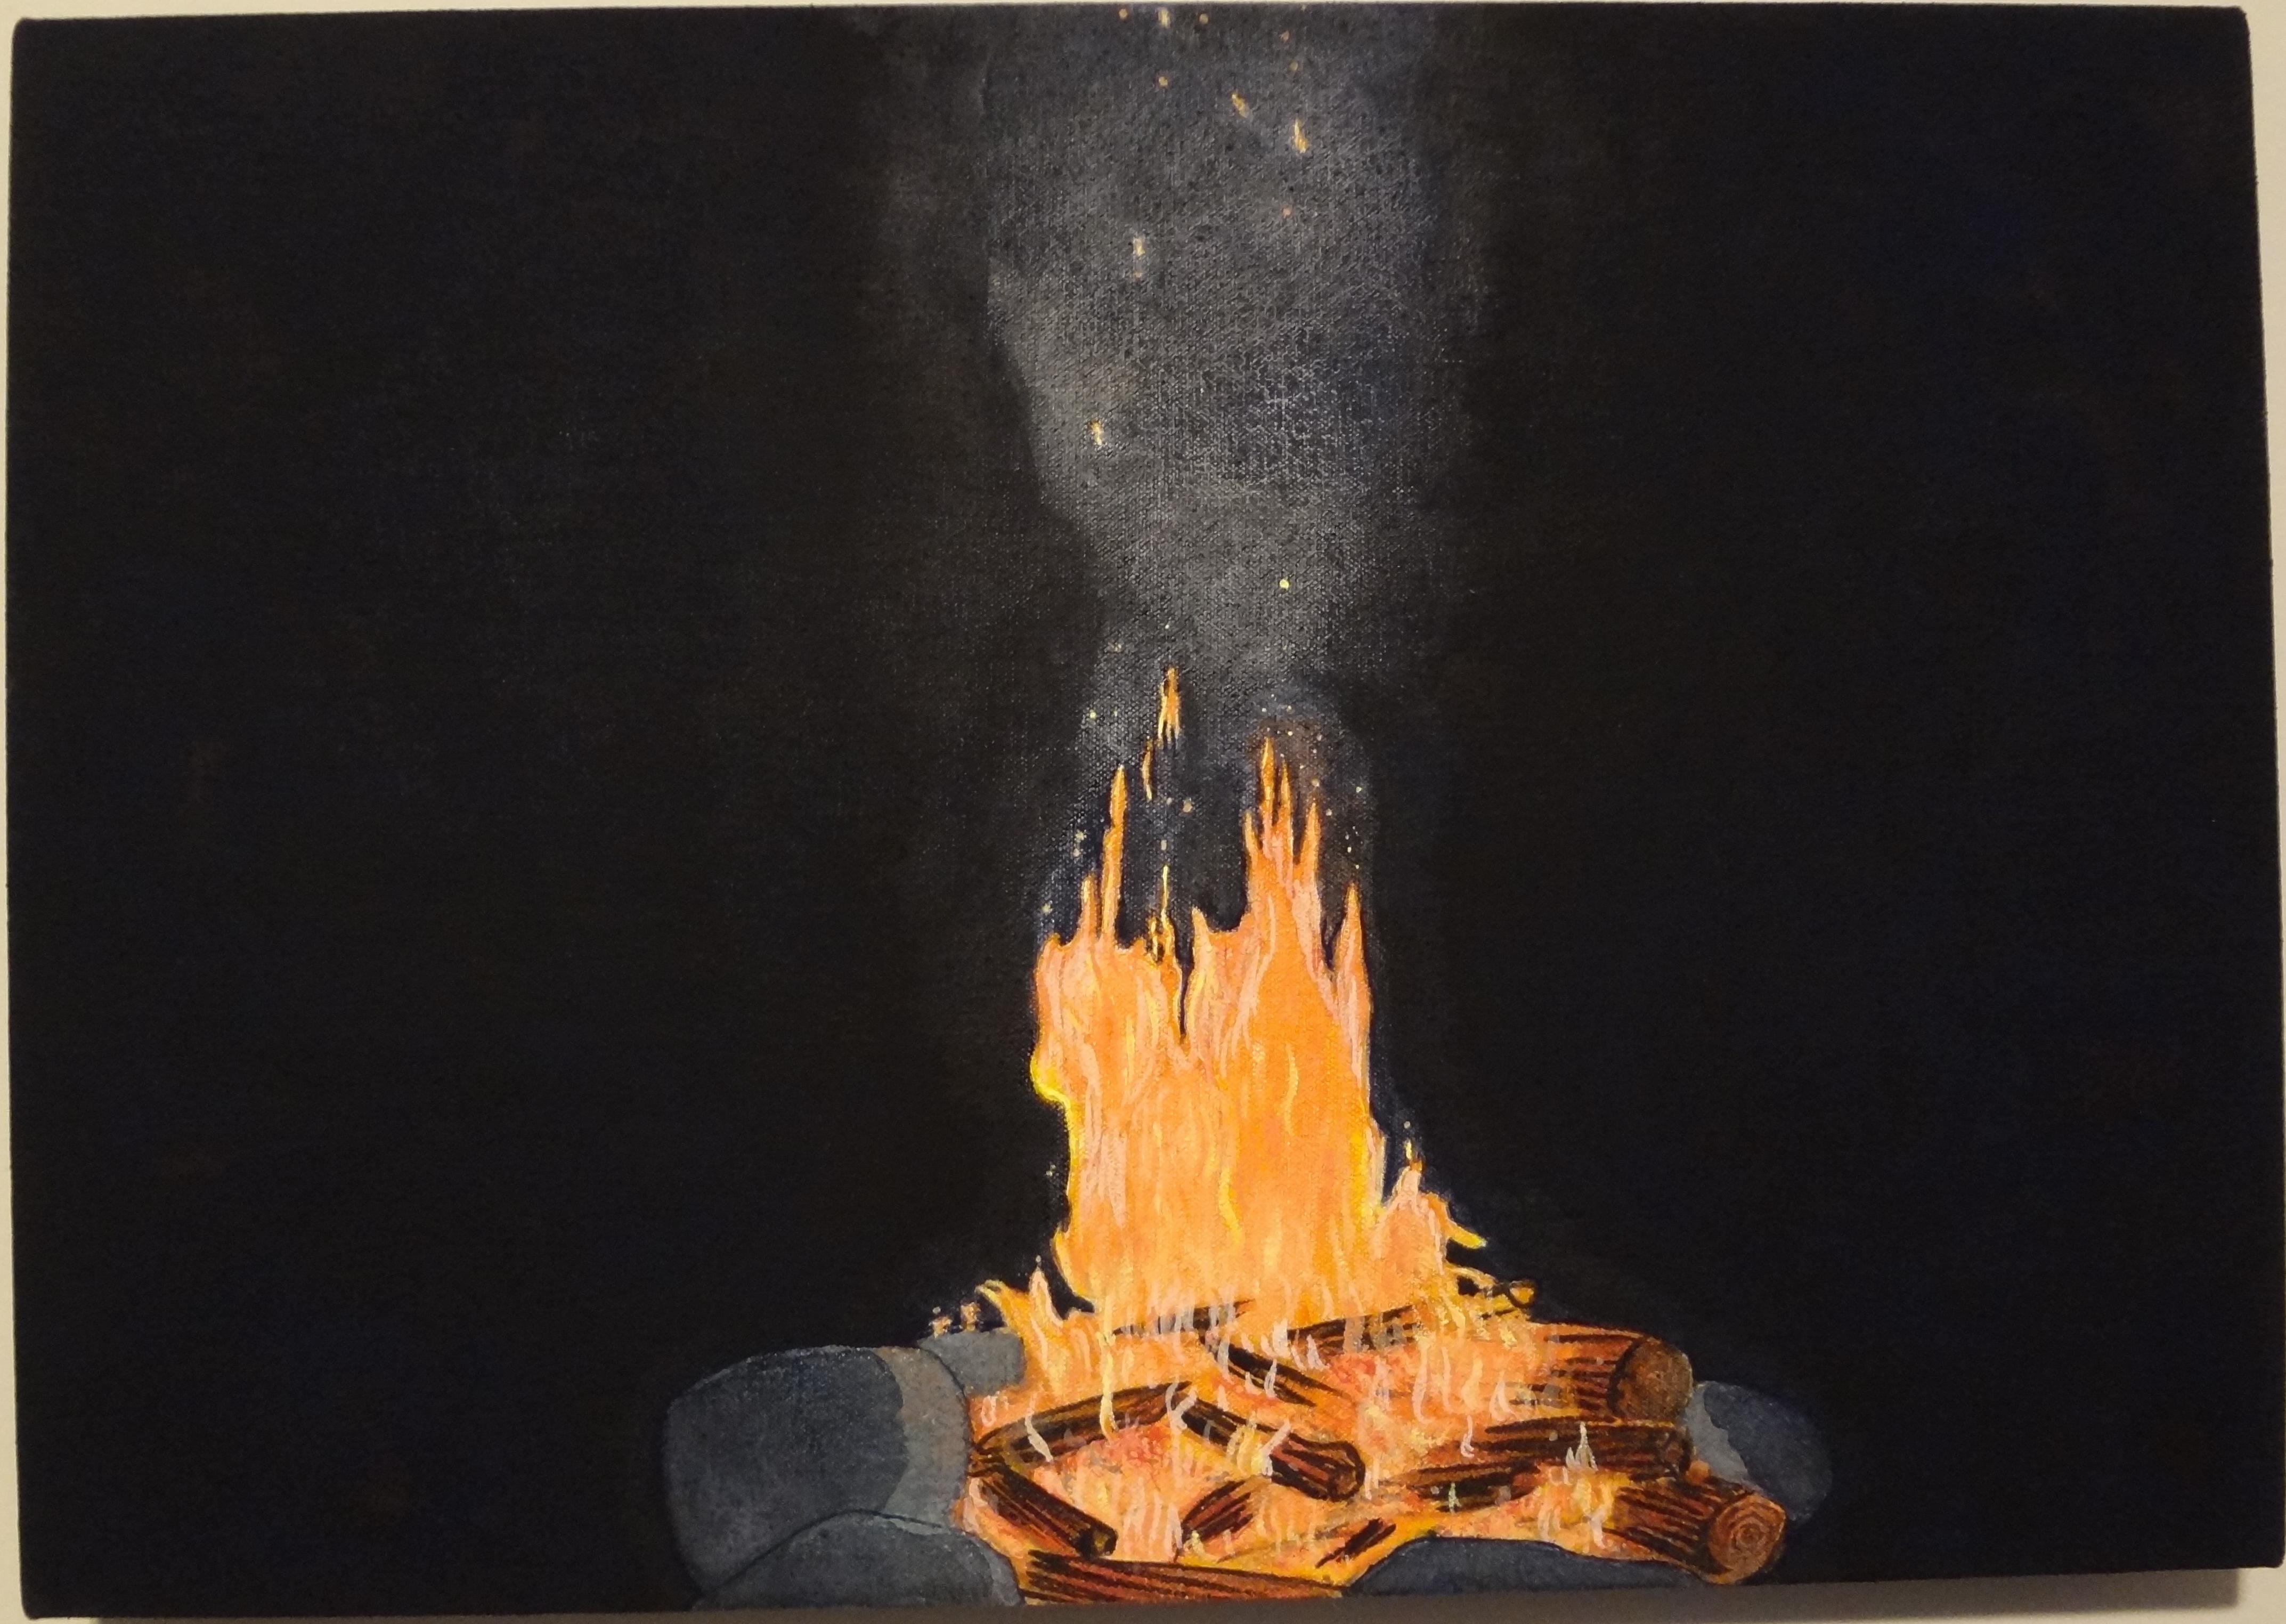 Daniel Fabian - Campfire 2012